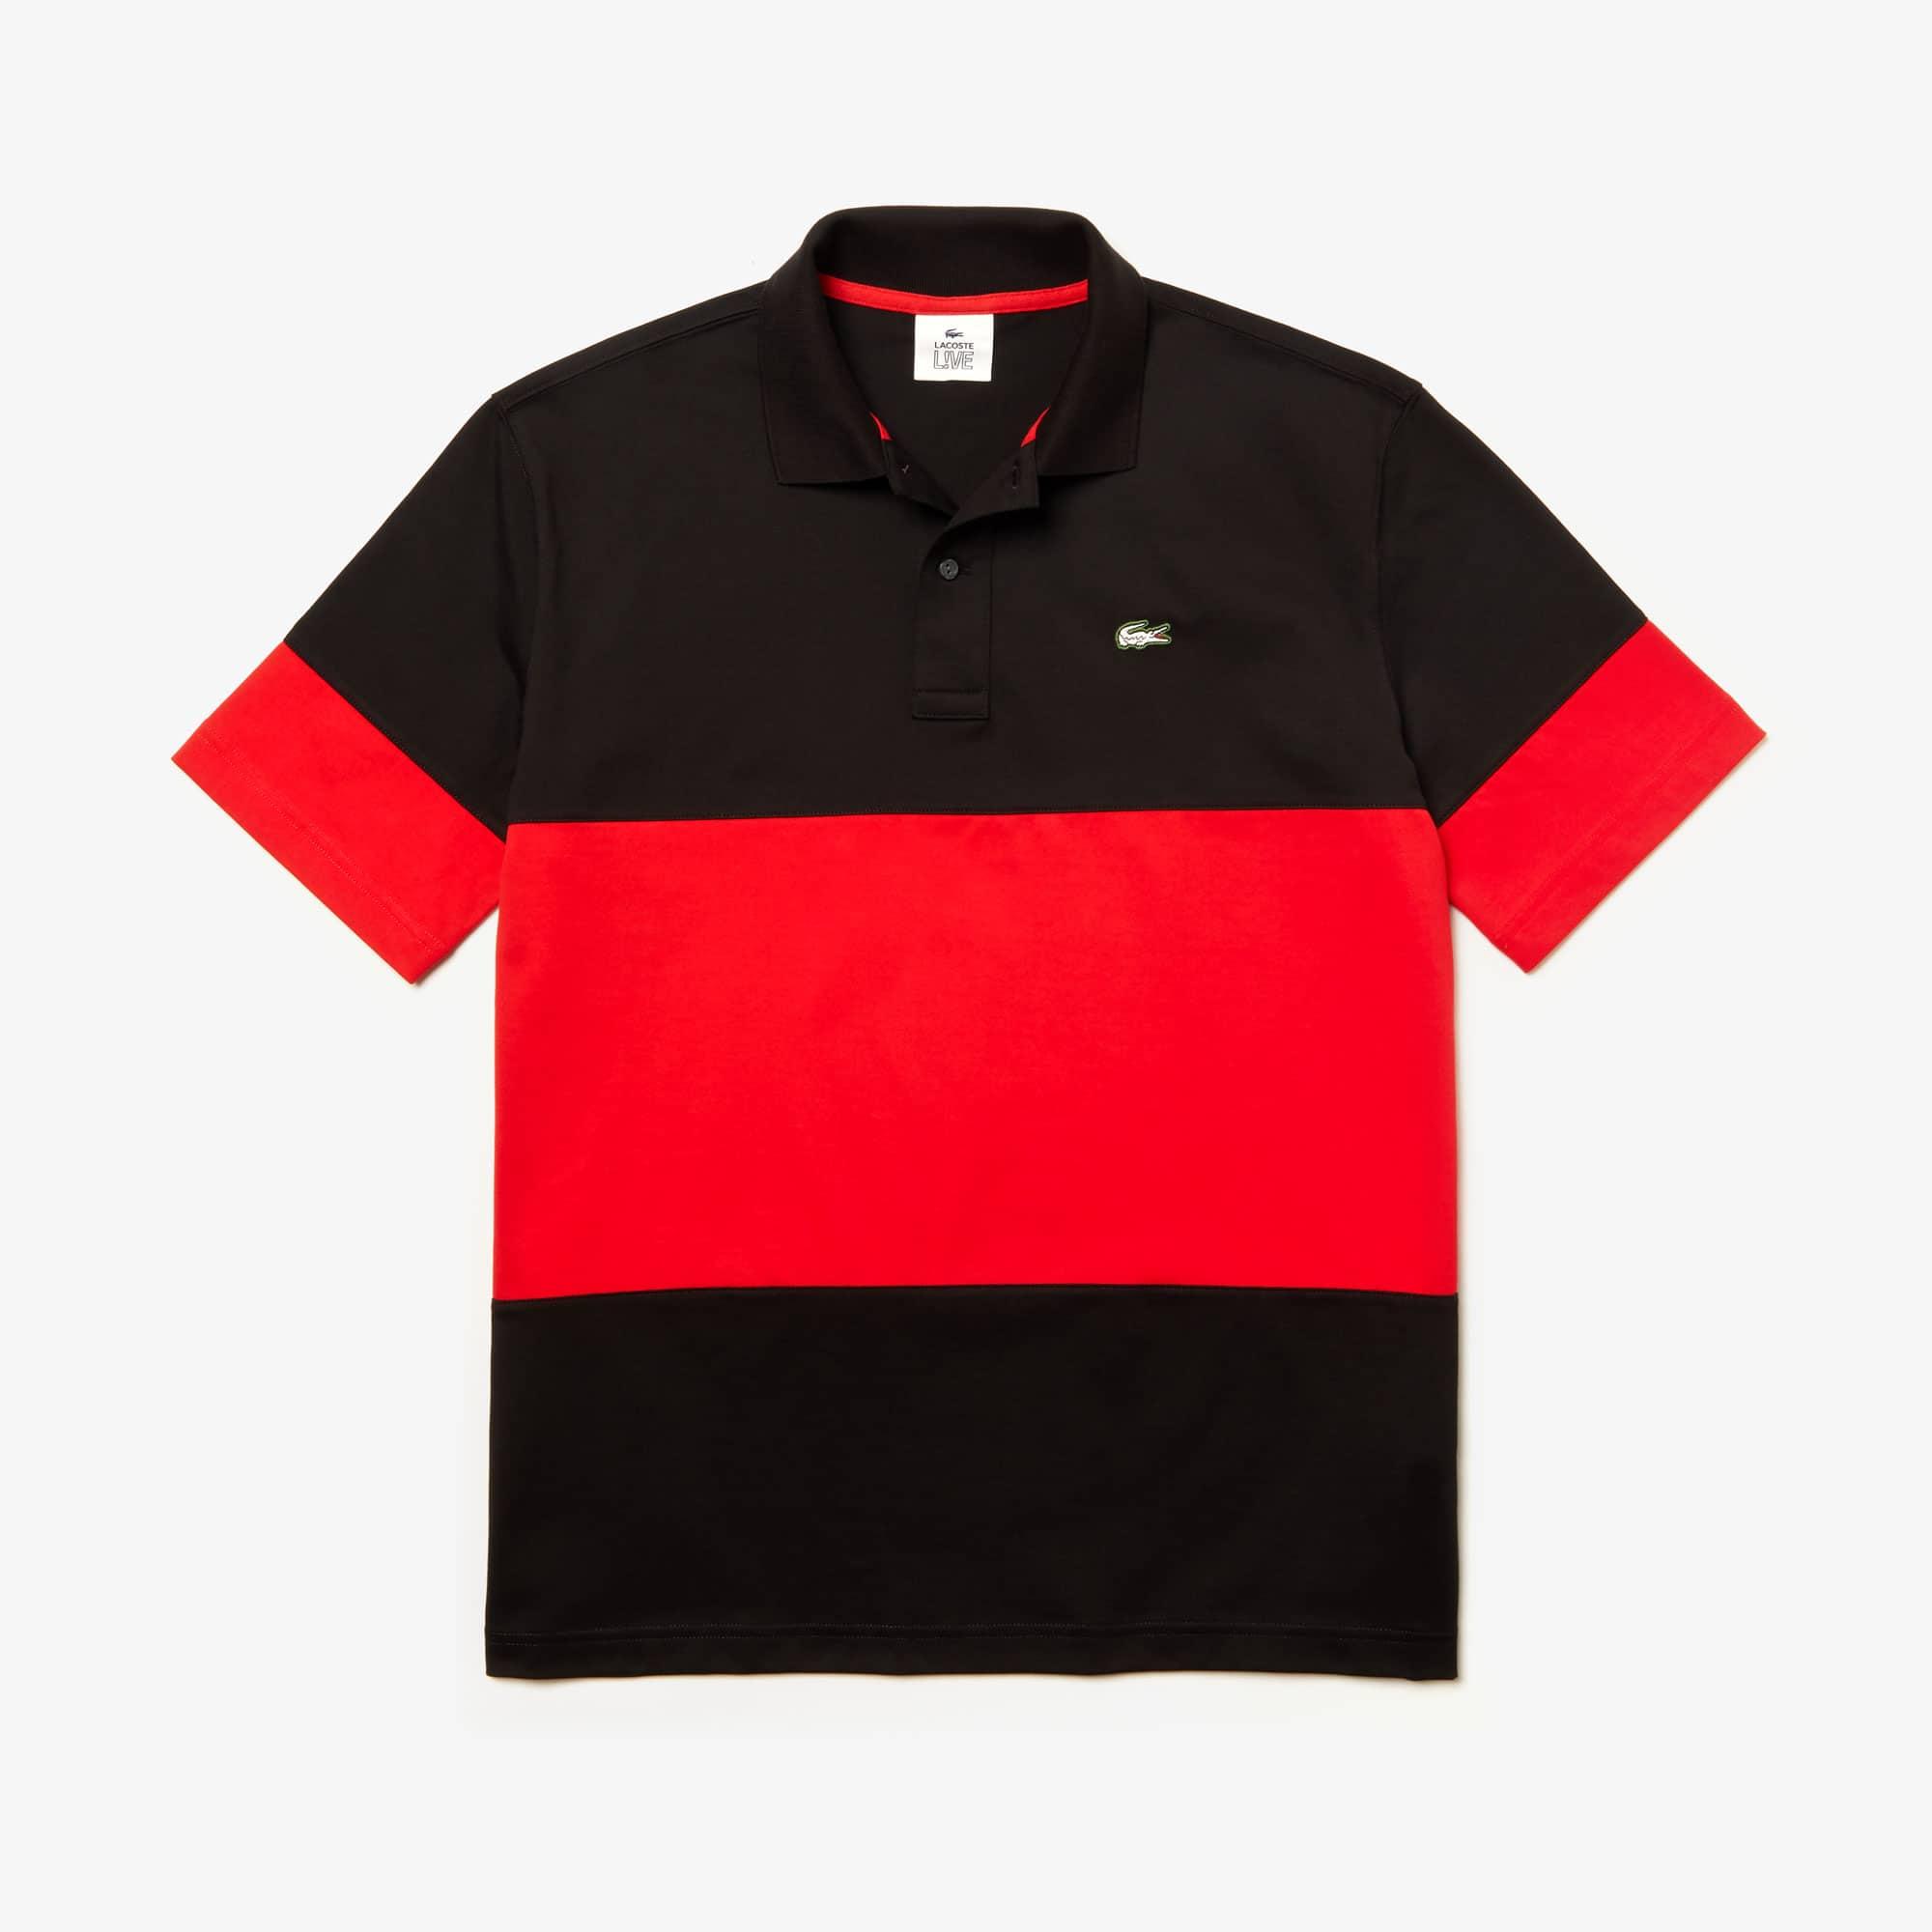 e510562435eb1 Men's polo shirts | Men's Fashion | LACOSTE LIVE